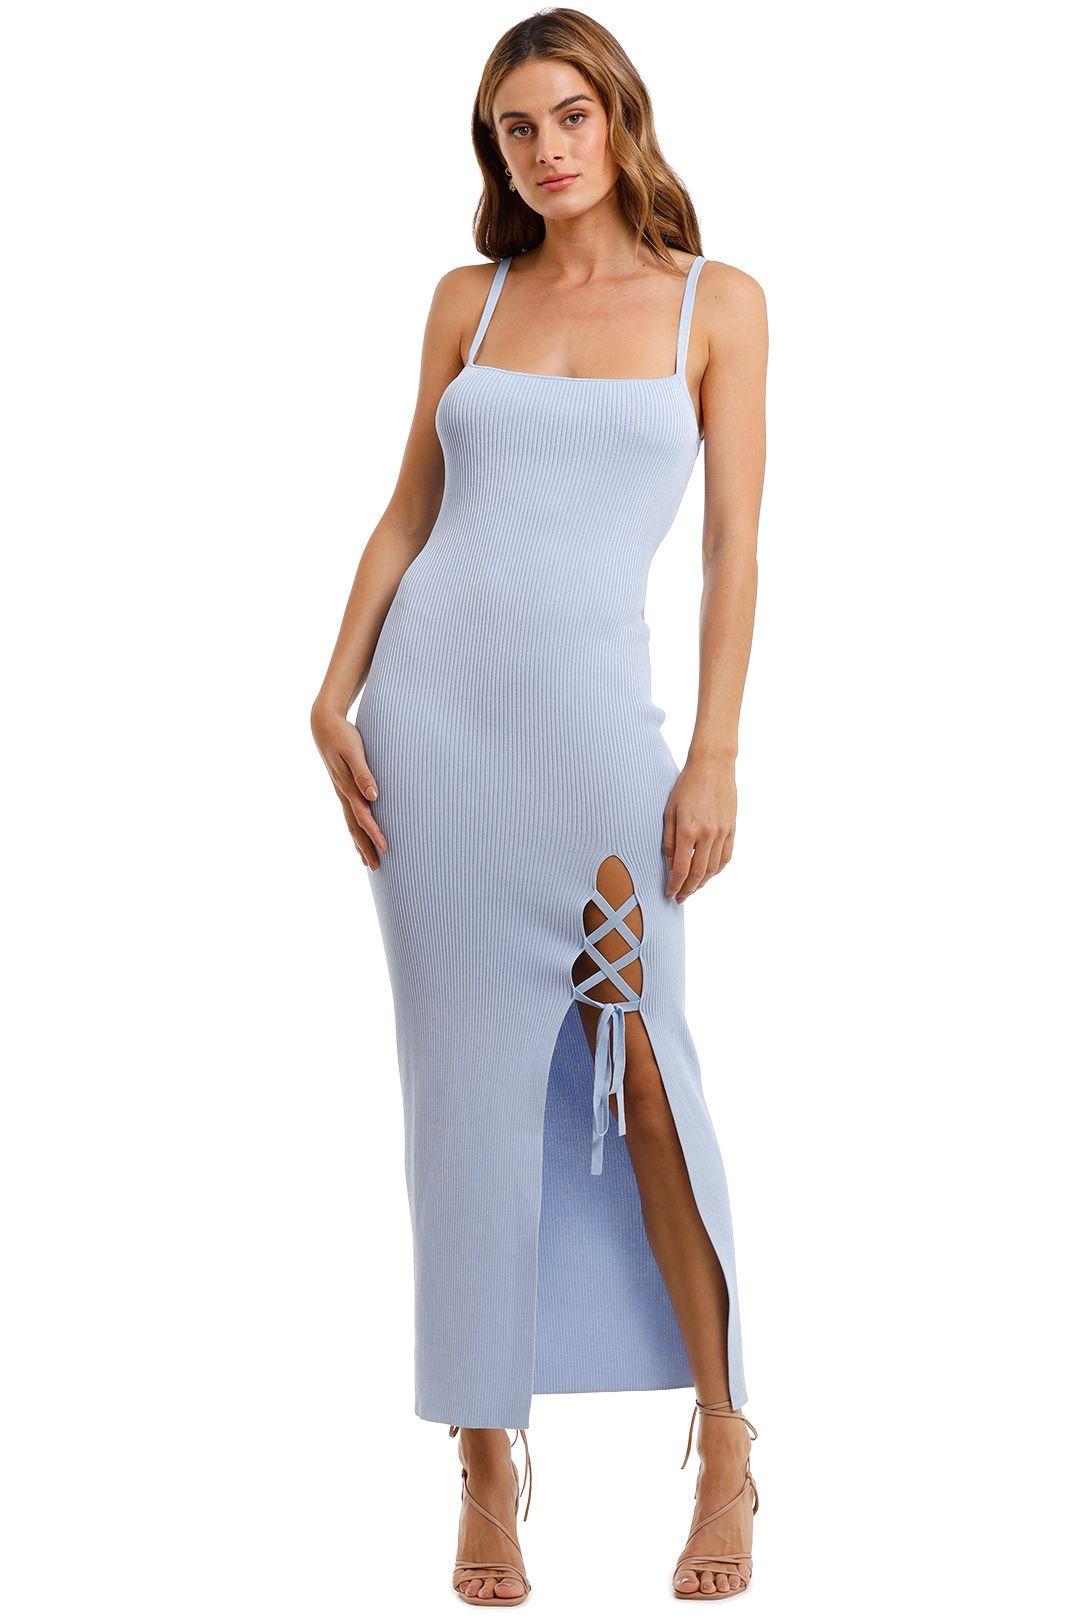 Bec and Bridge Lola Sky Blue Midi Dress tie detail